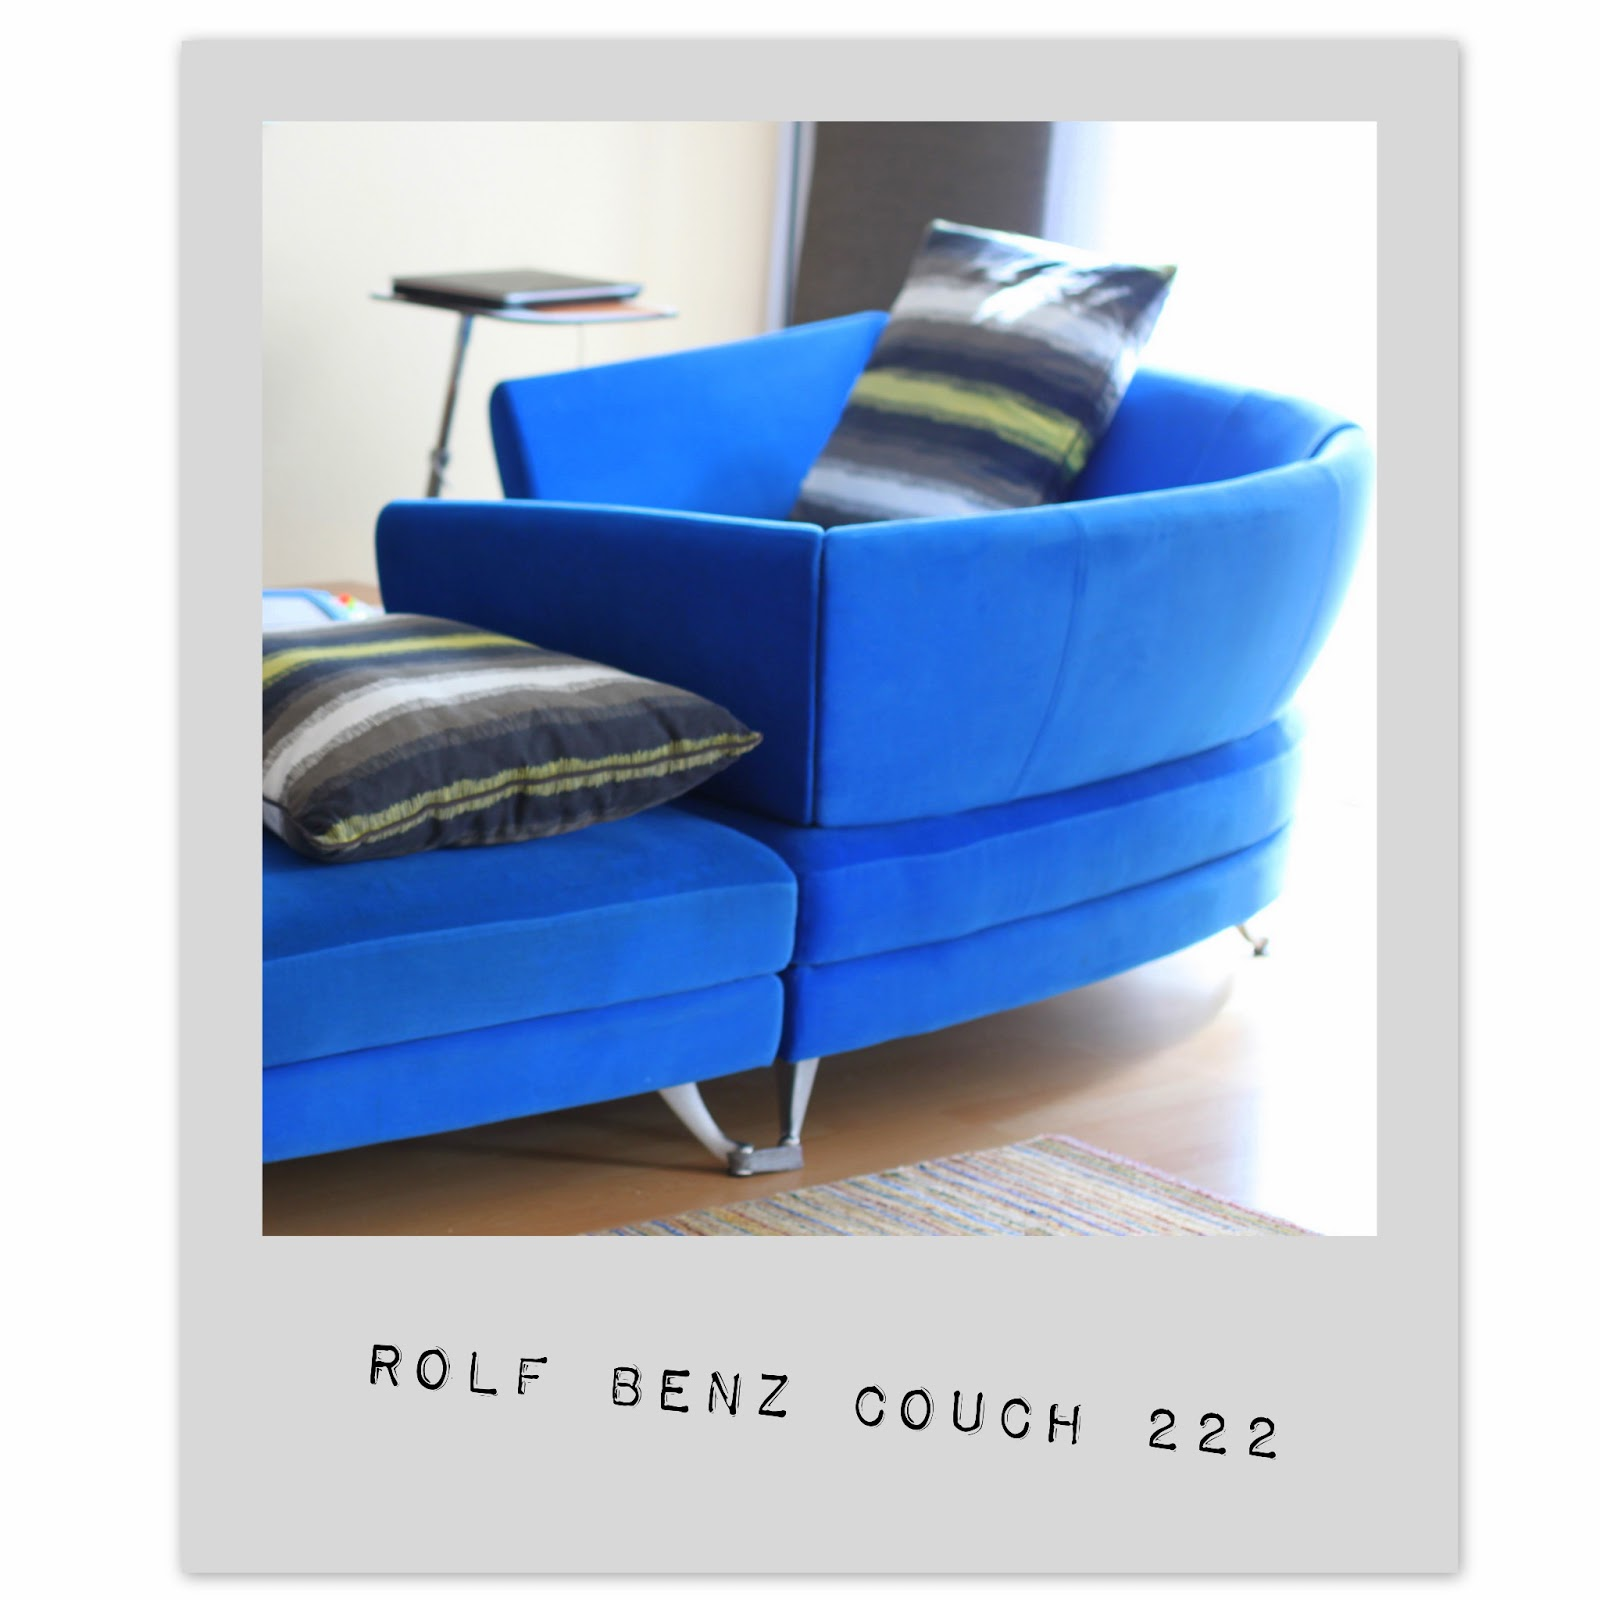 Paecyipato Rolf Benz Couch 222 Paecyipato